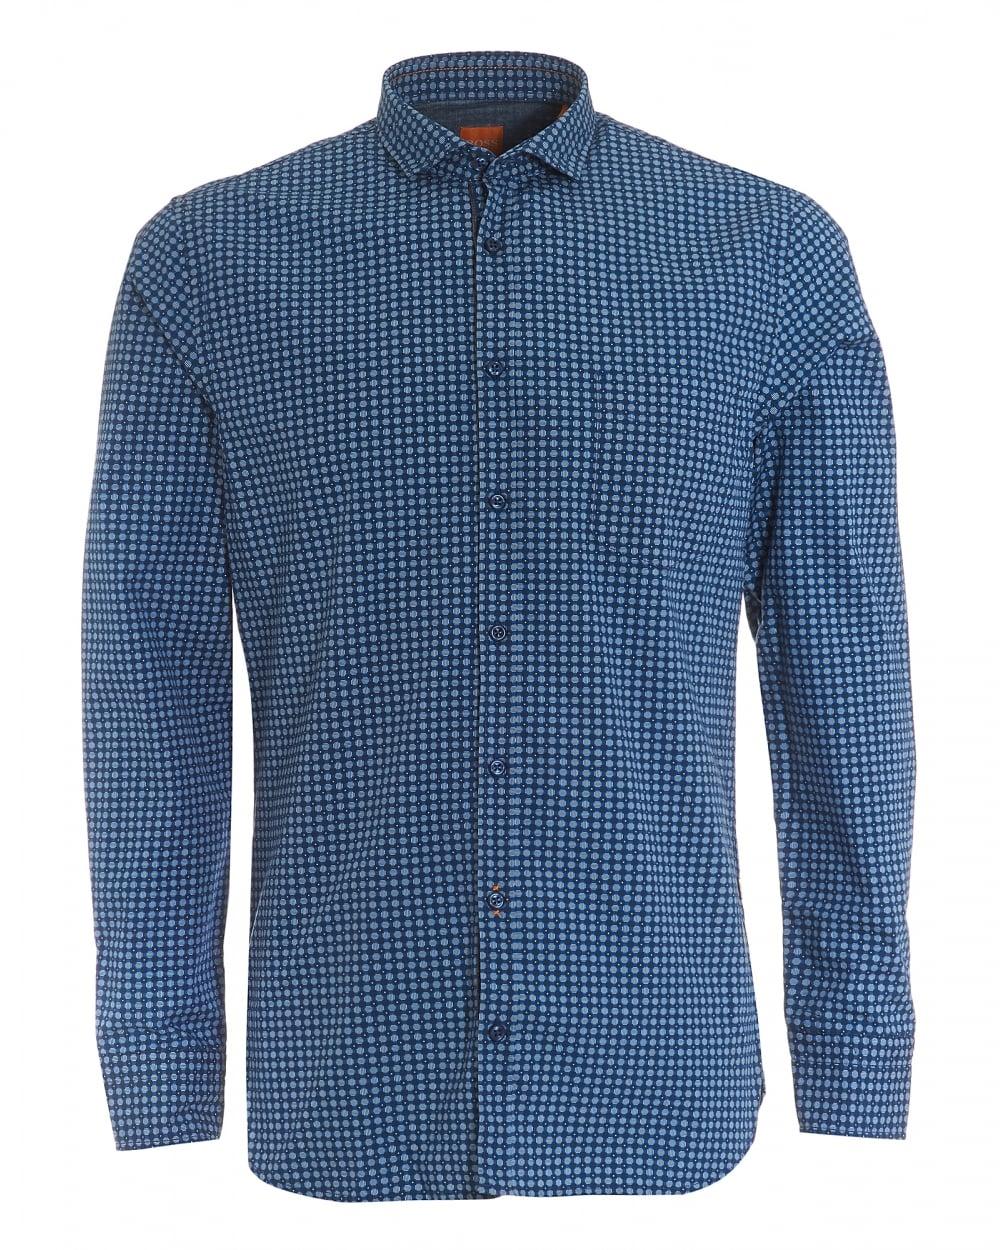 Mens Cattitude Slim Fit Geometric Print Navy Blue Shirt